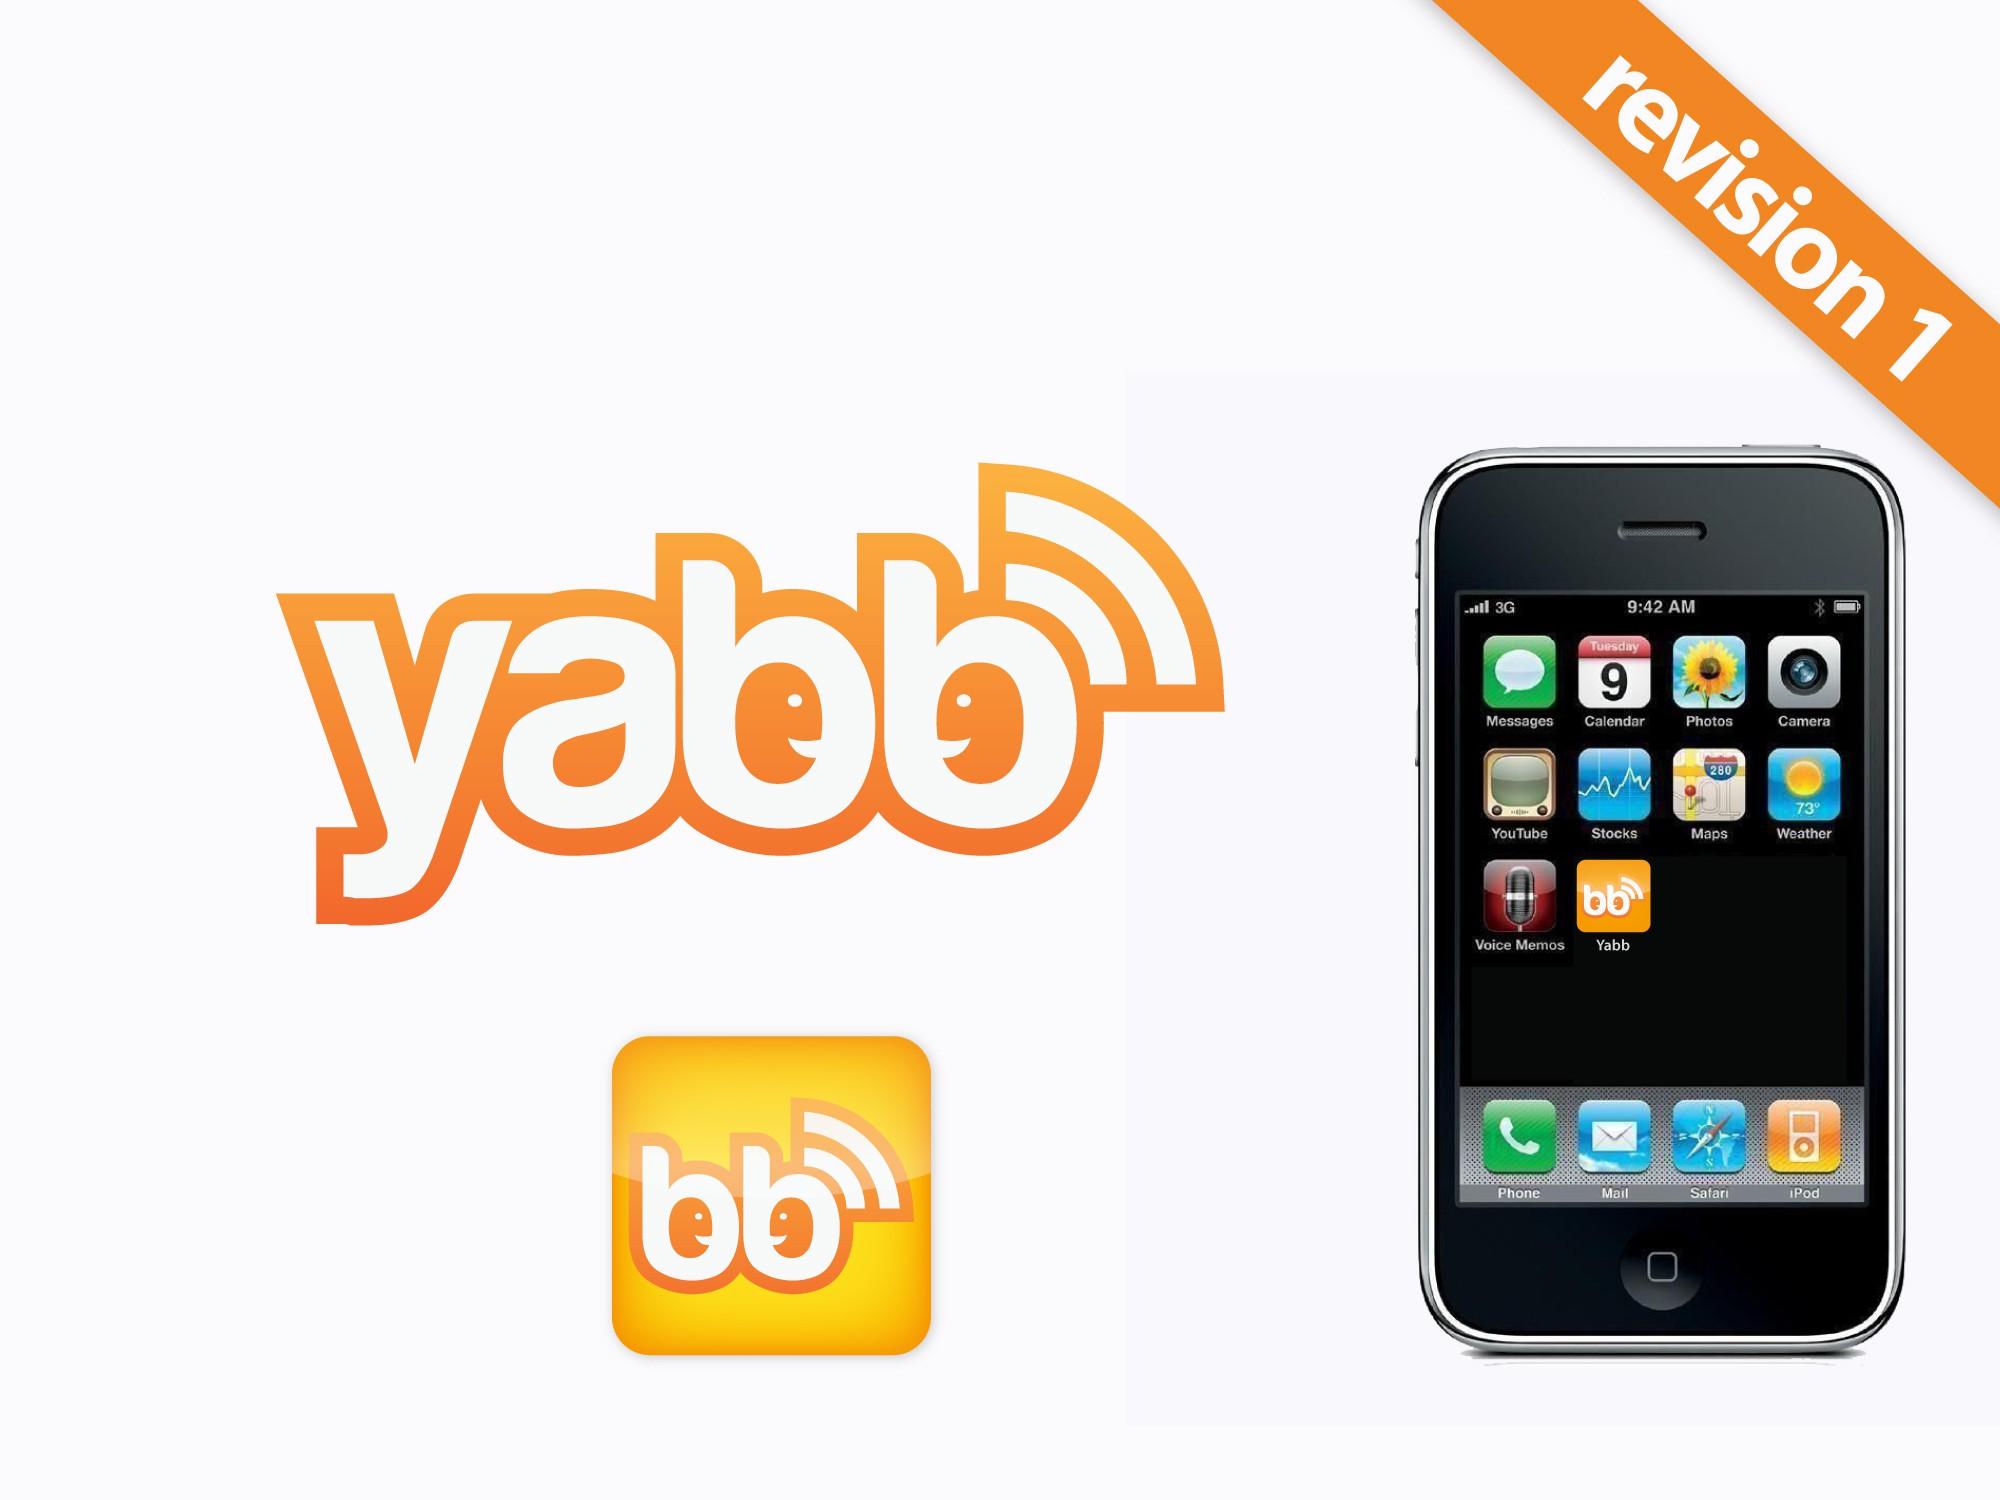 Help Yabb with a new logo